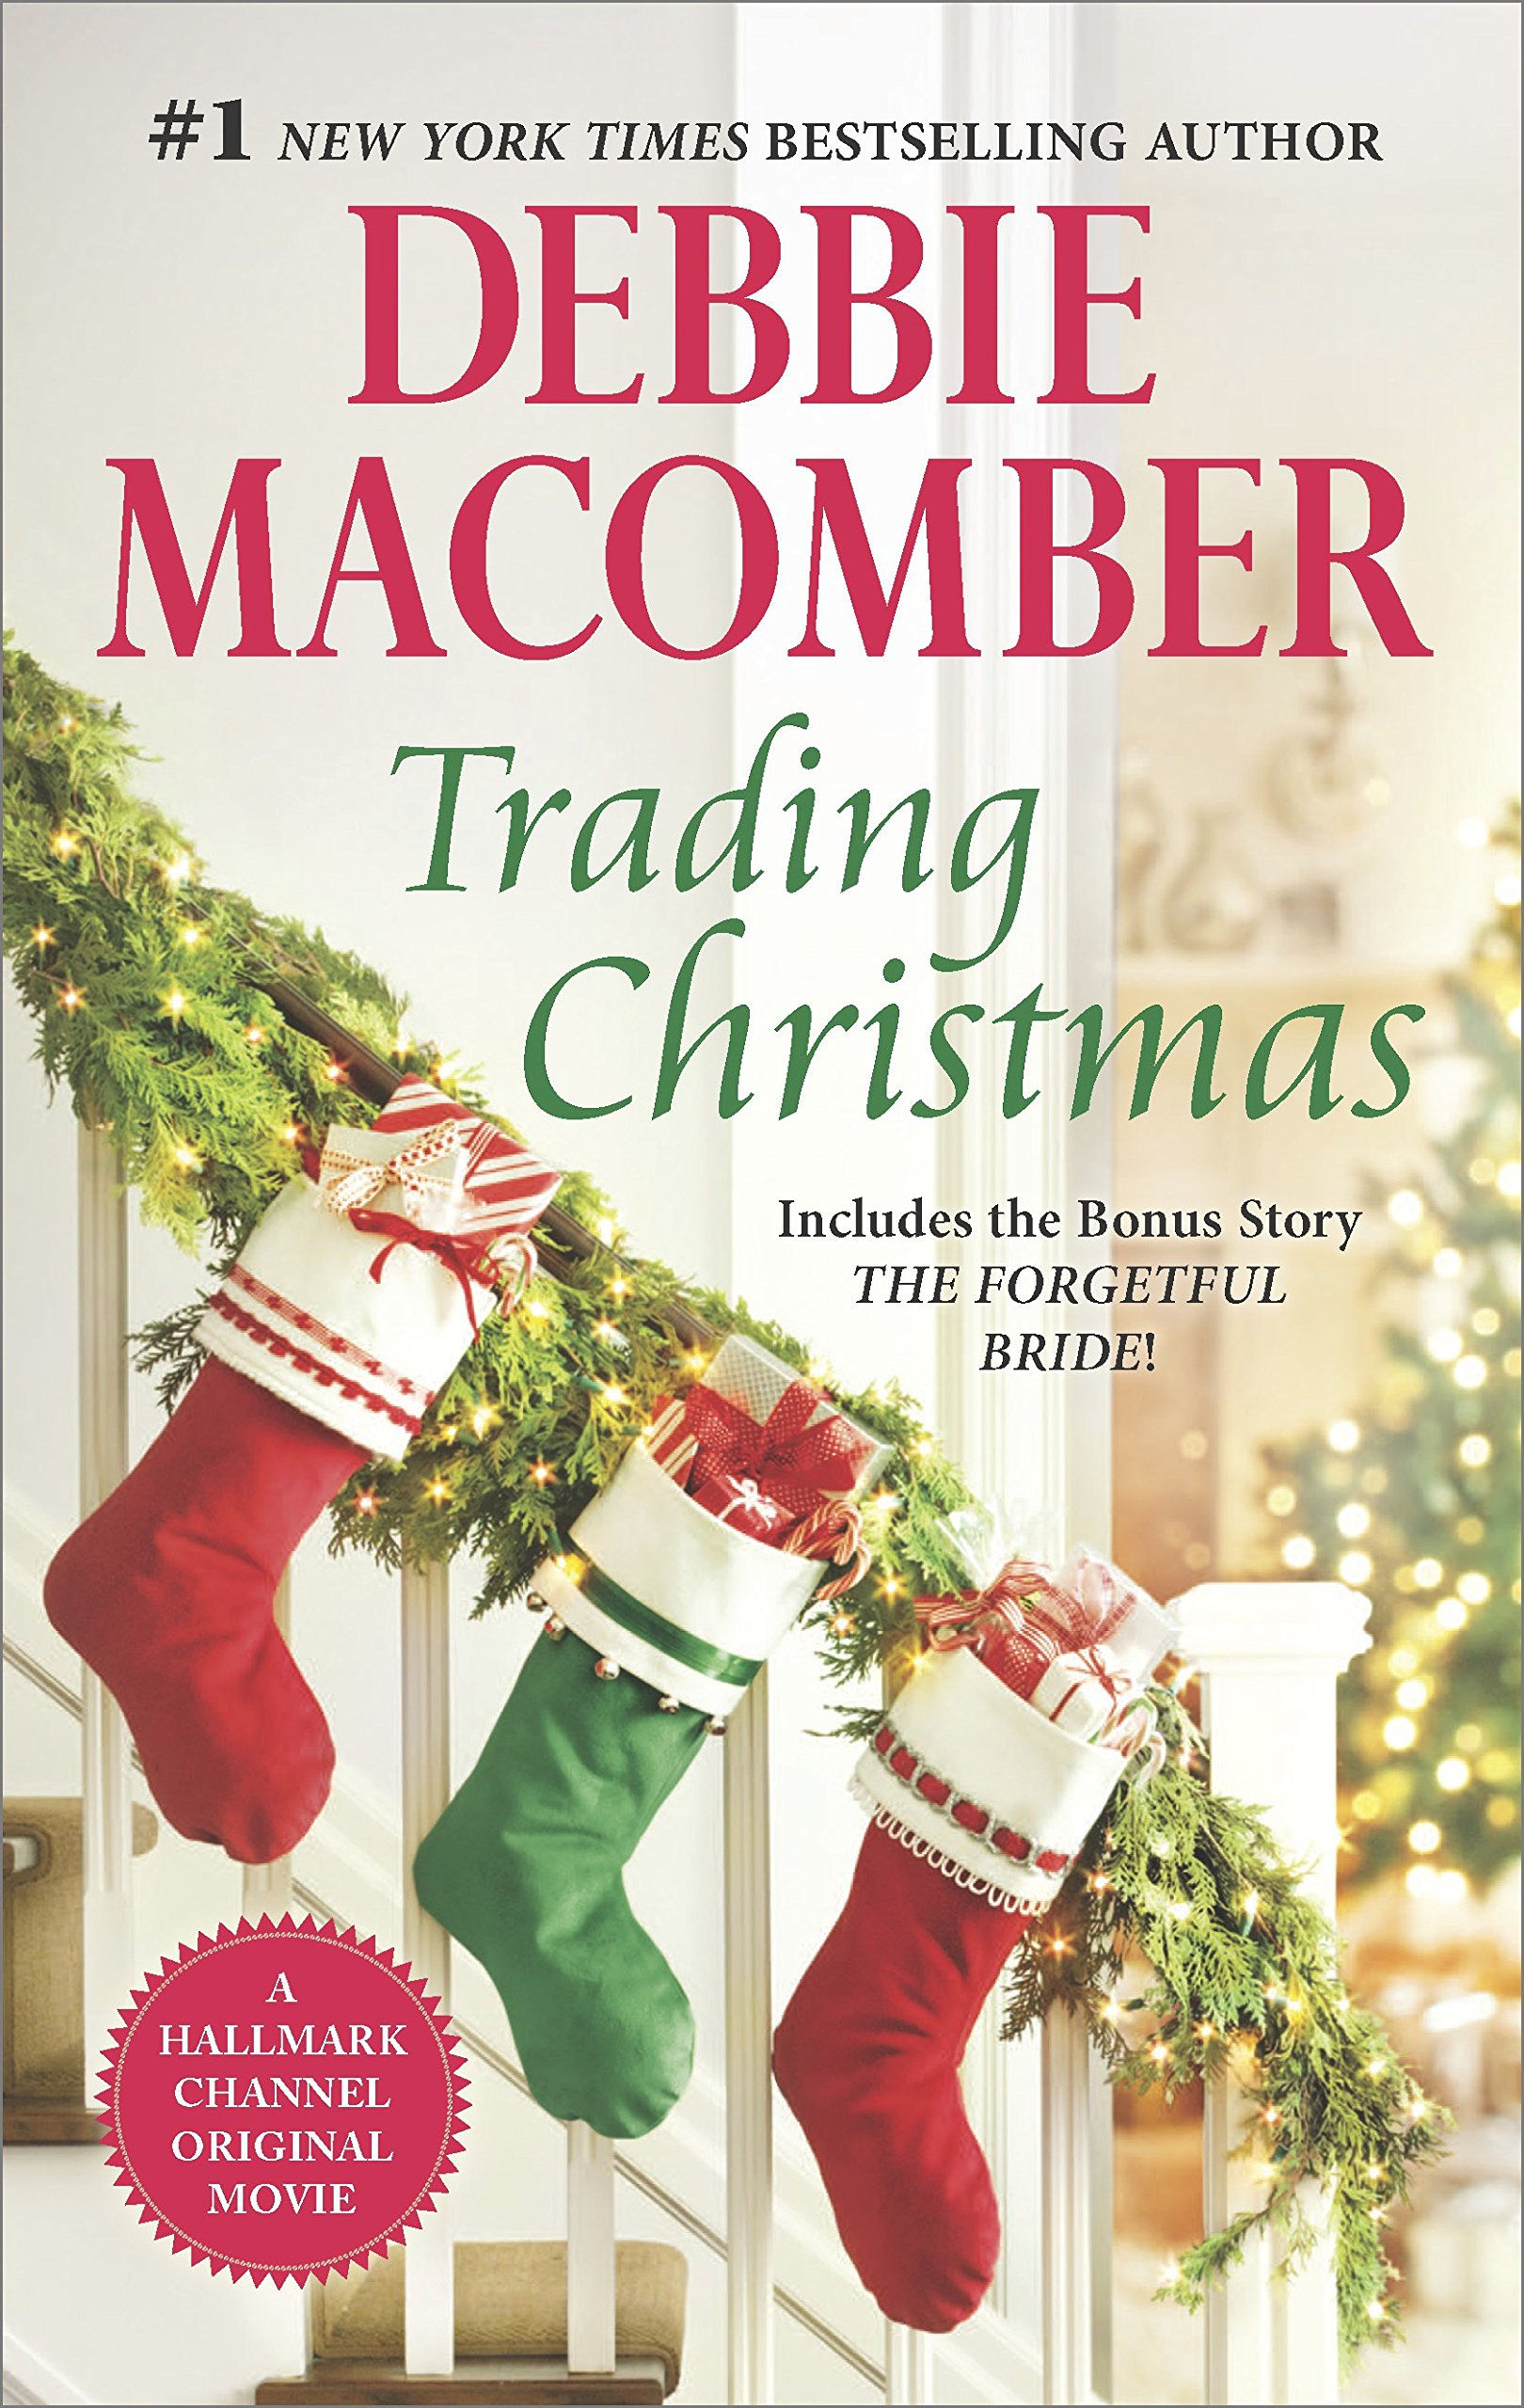 Amazon.com: Trading Christmas: The Forgetful Bride (9780778318293 ...